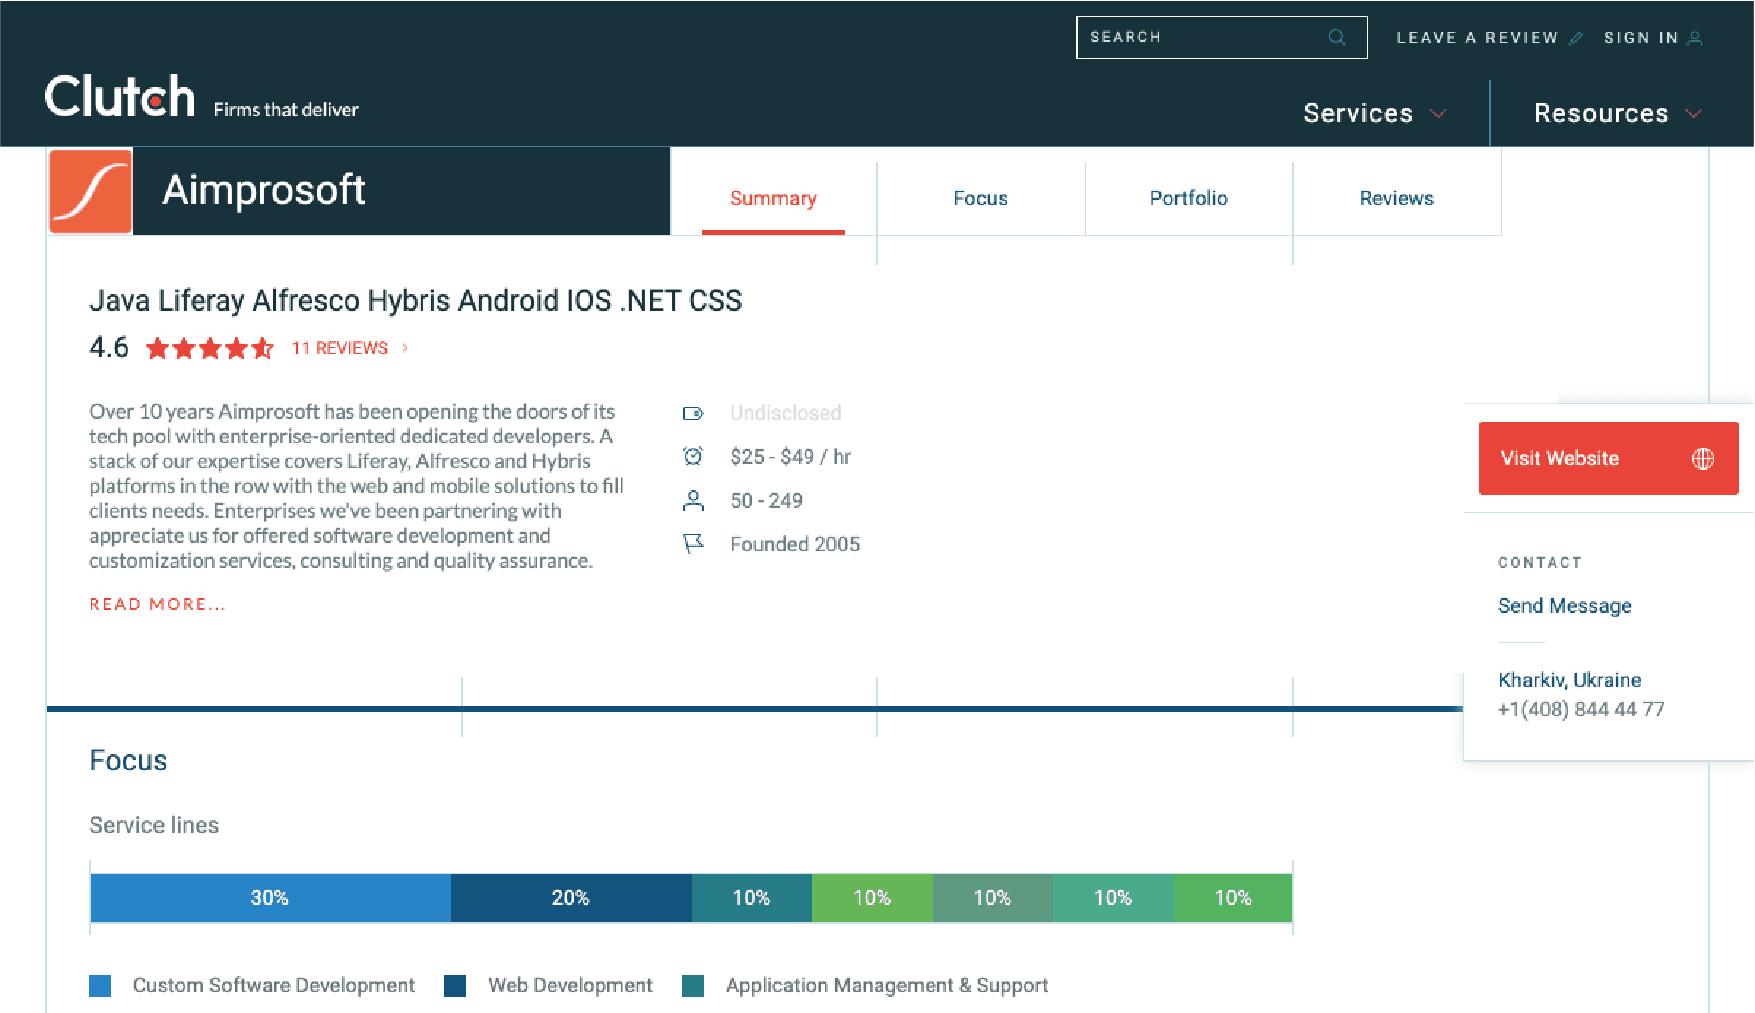 Aimprosoft's profile on Clutch